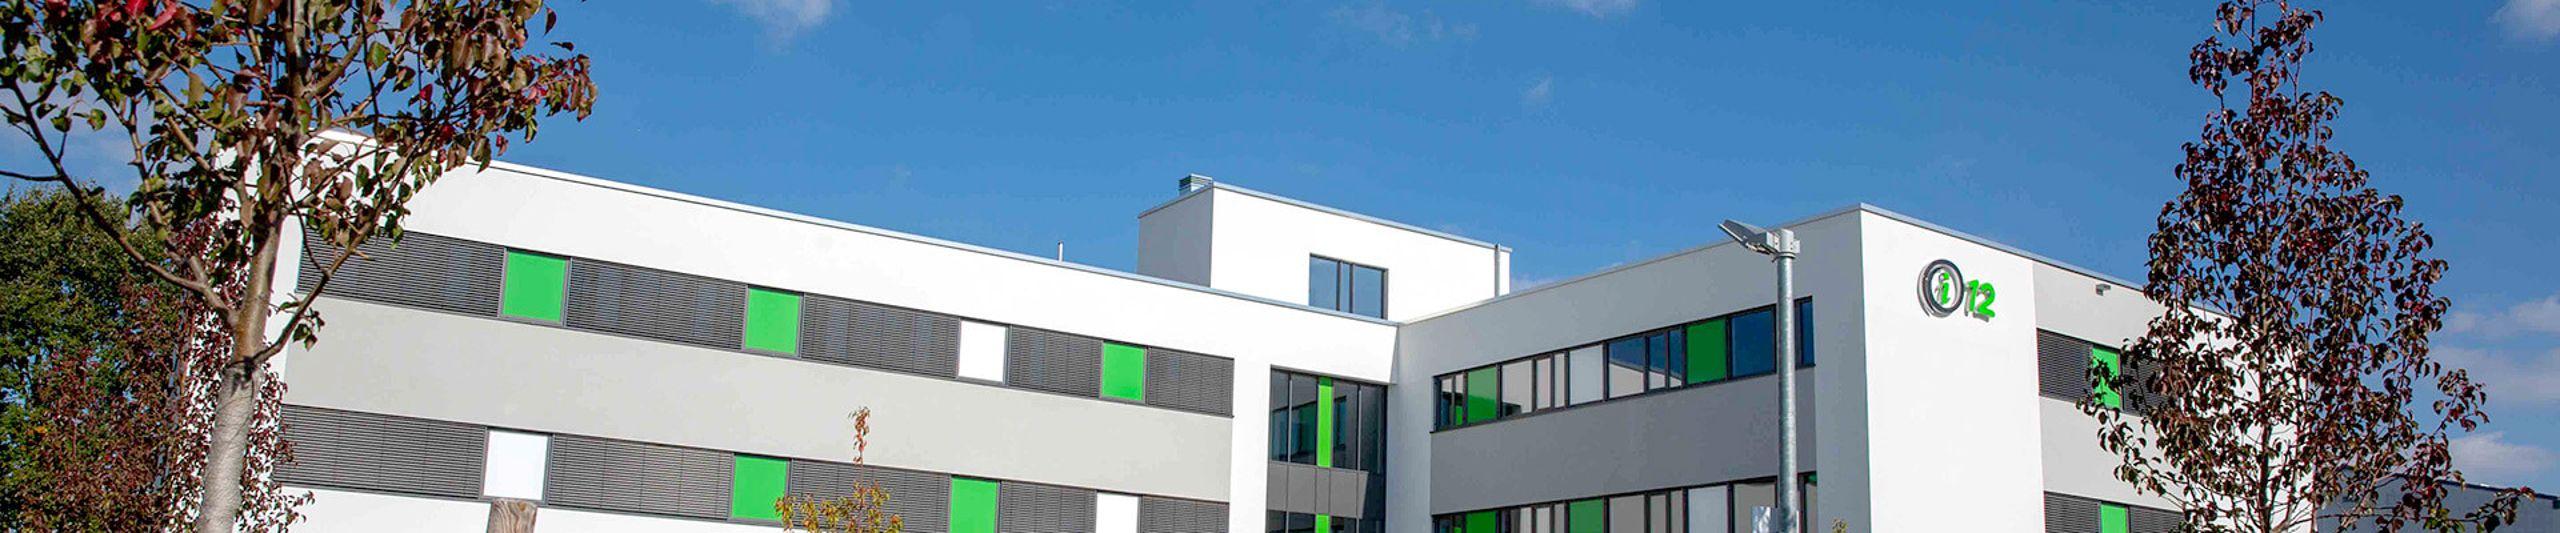 Bürobau - Bürogebäude mit Flexibilität